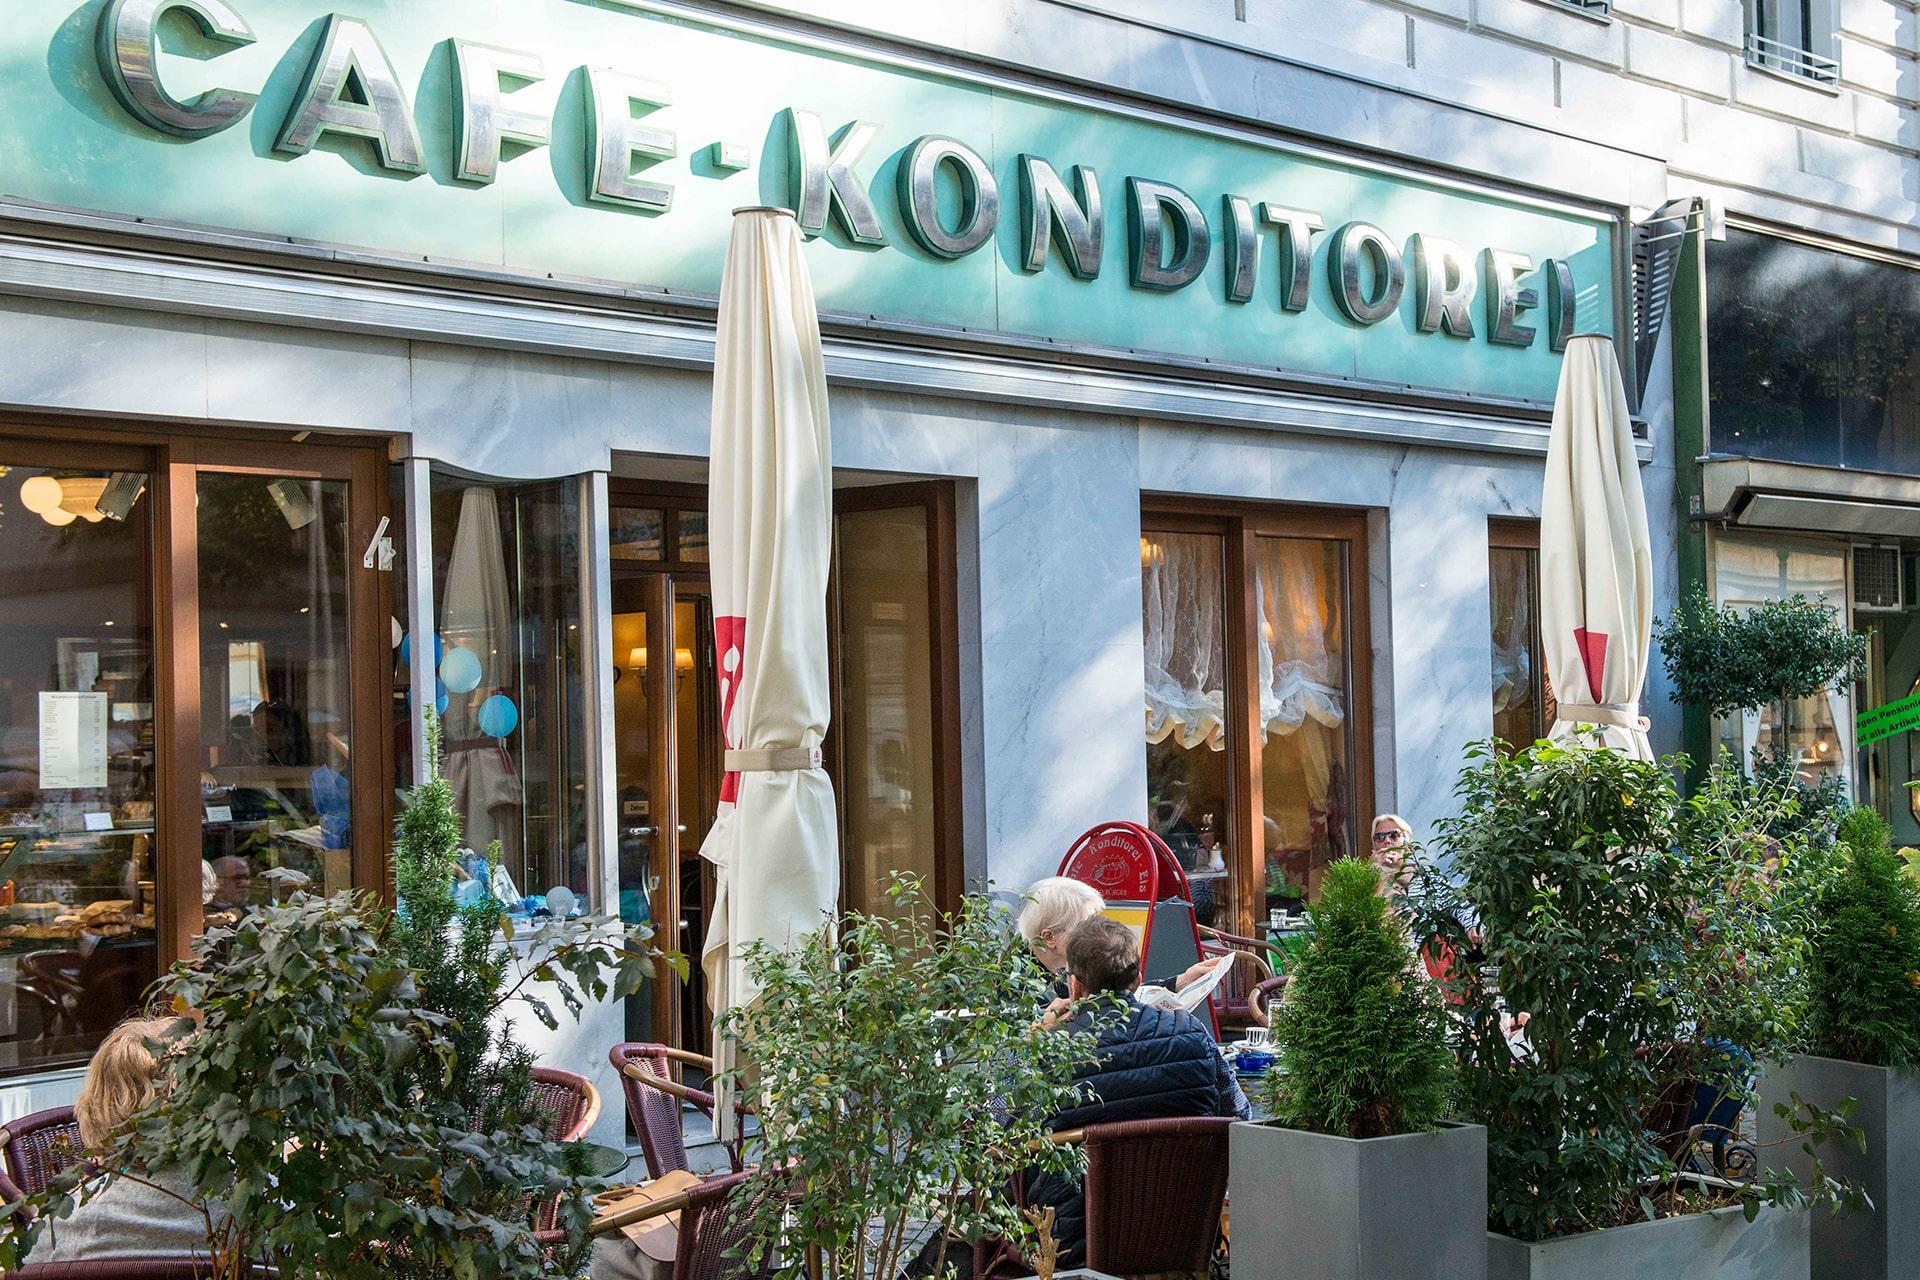 Café-Konditorei Bürger